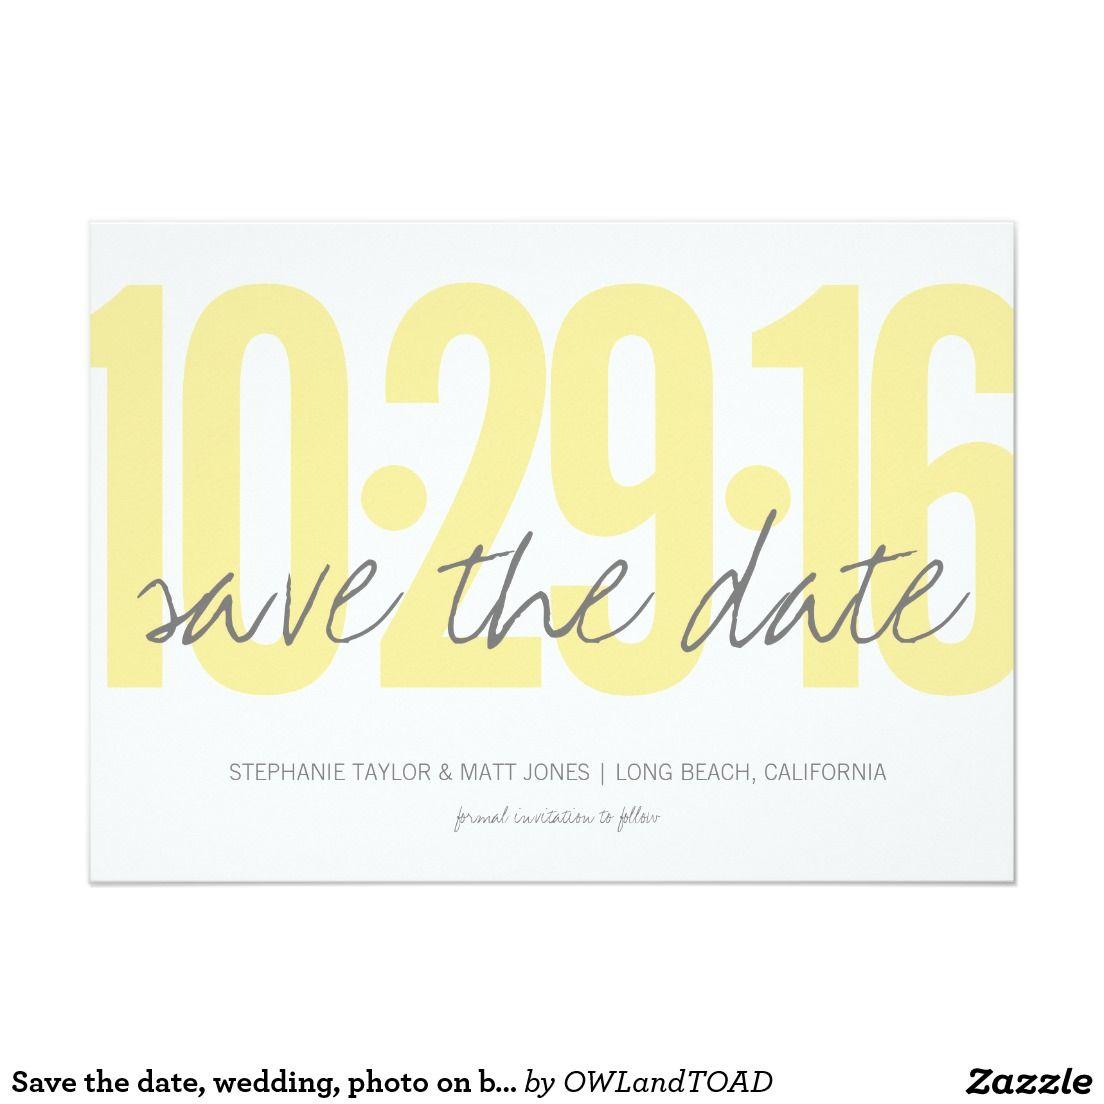 Save The Date Wedding Photo On Back Card Yellow Gray Weddings